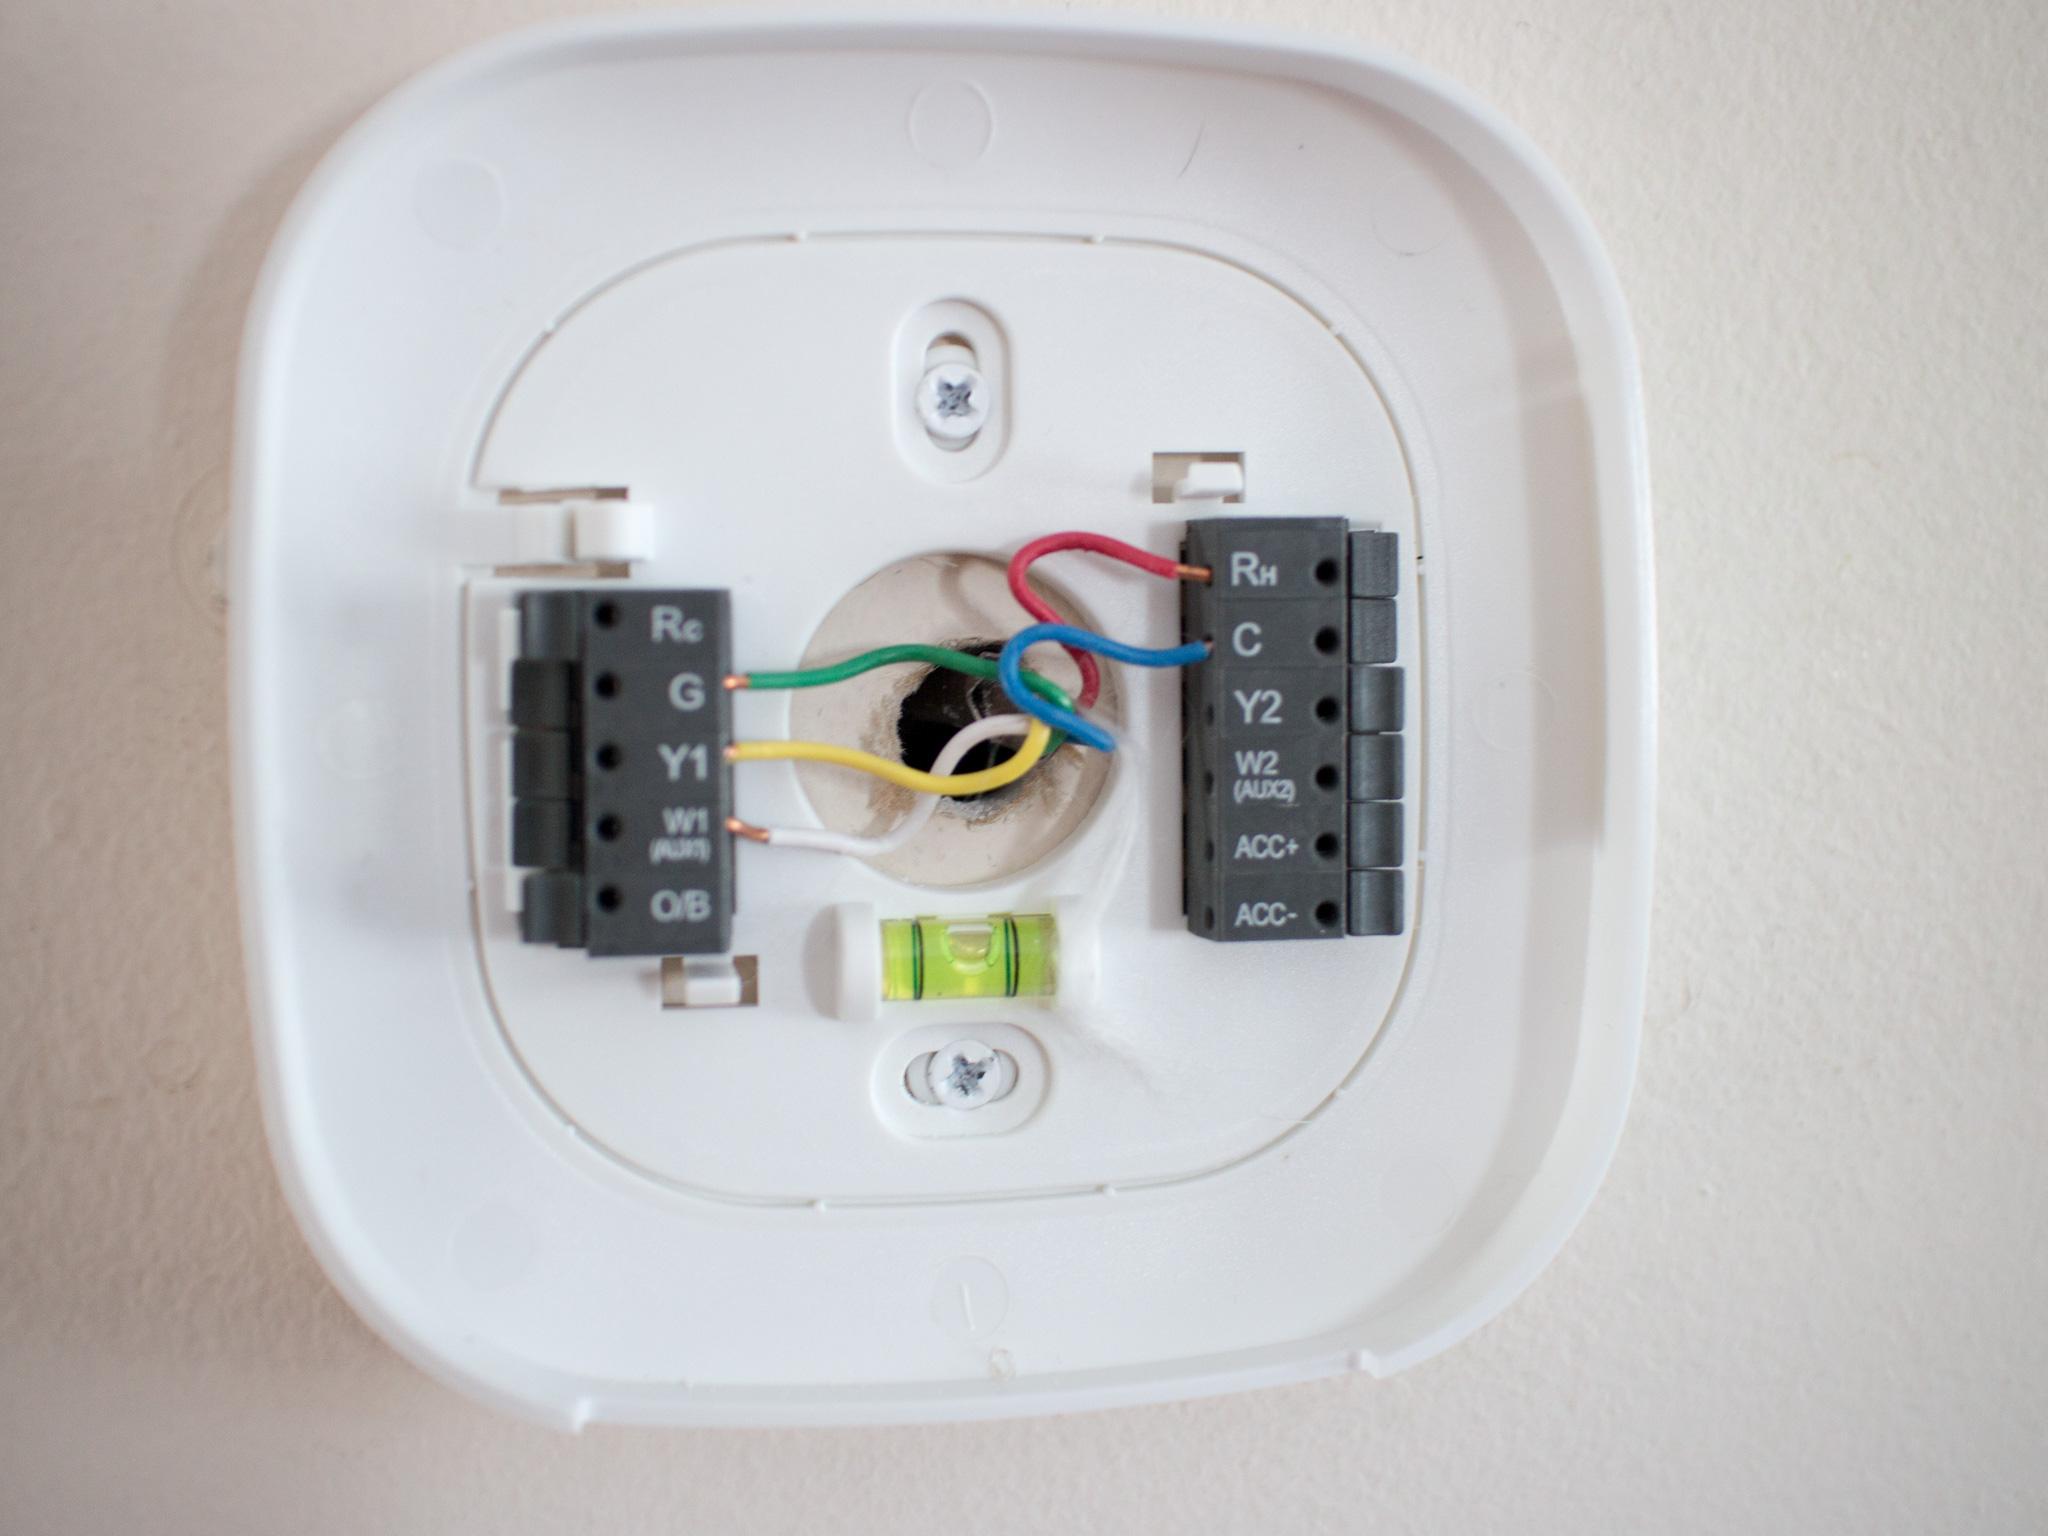 ecobee wiring diagram leviton 4 way light switch ecobee3 and trane xl80 doityourself community